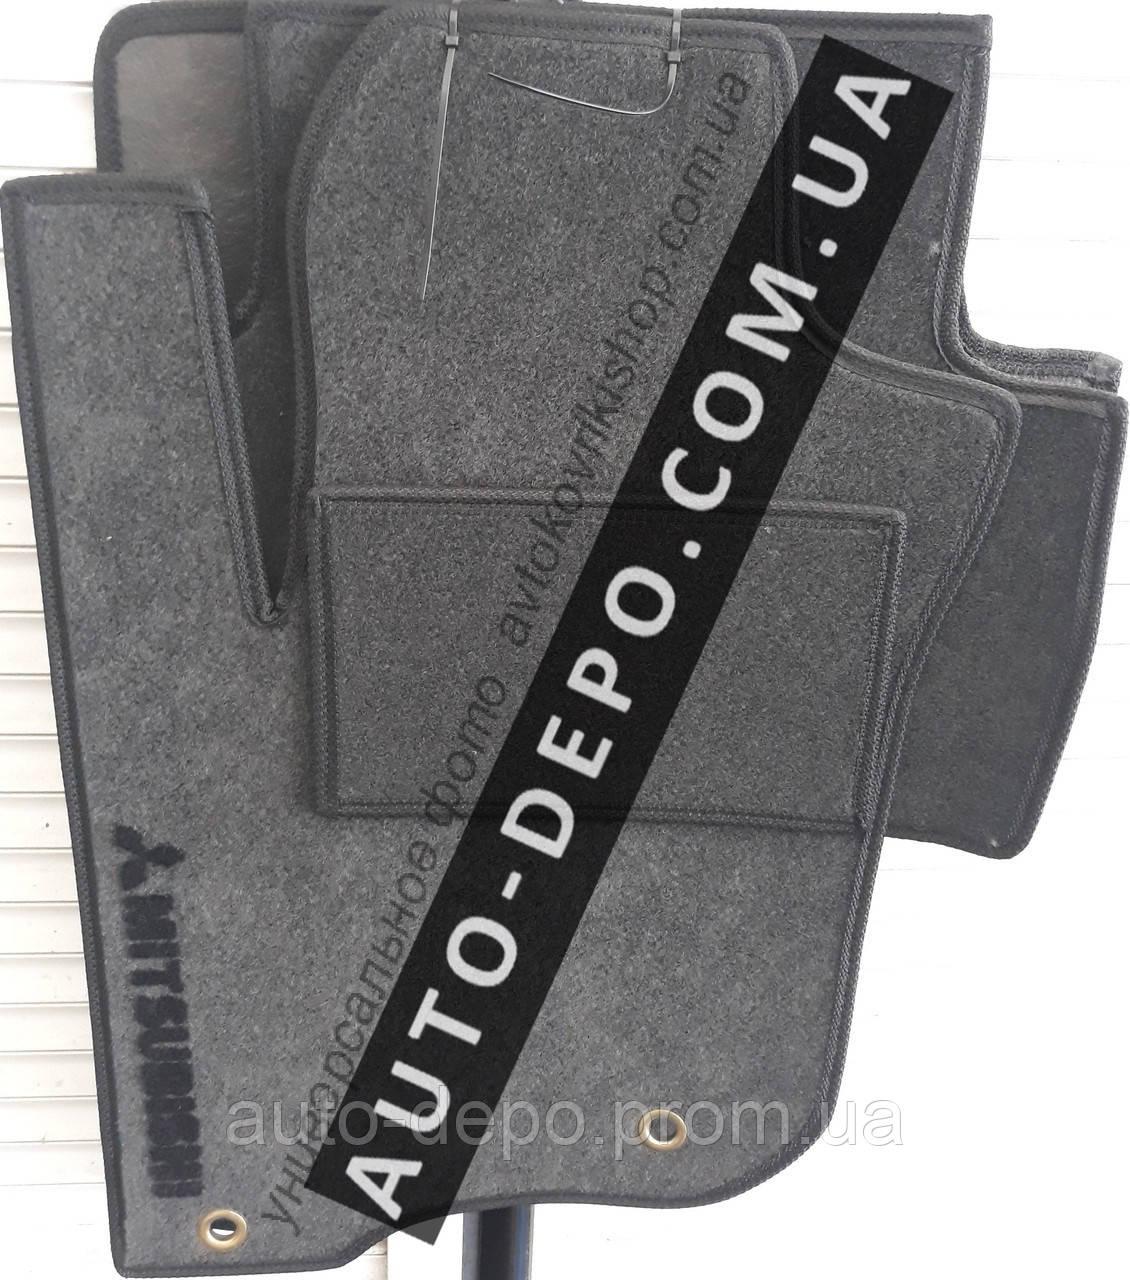 Ворсовые коврики Mitsubishi Grandis (7-мест) 2003- VIP ЛЮКС АВТО-ВОРС